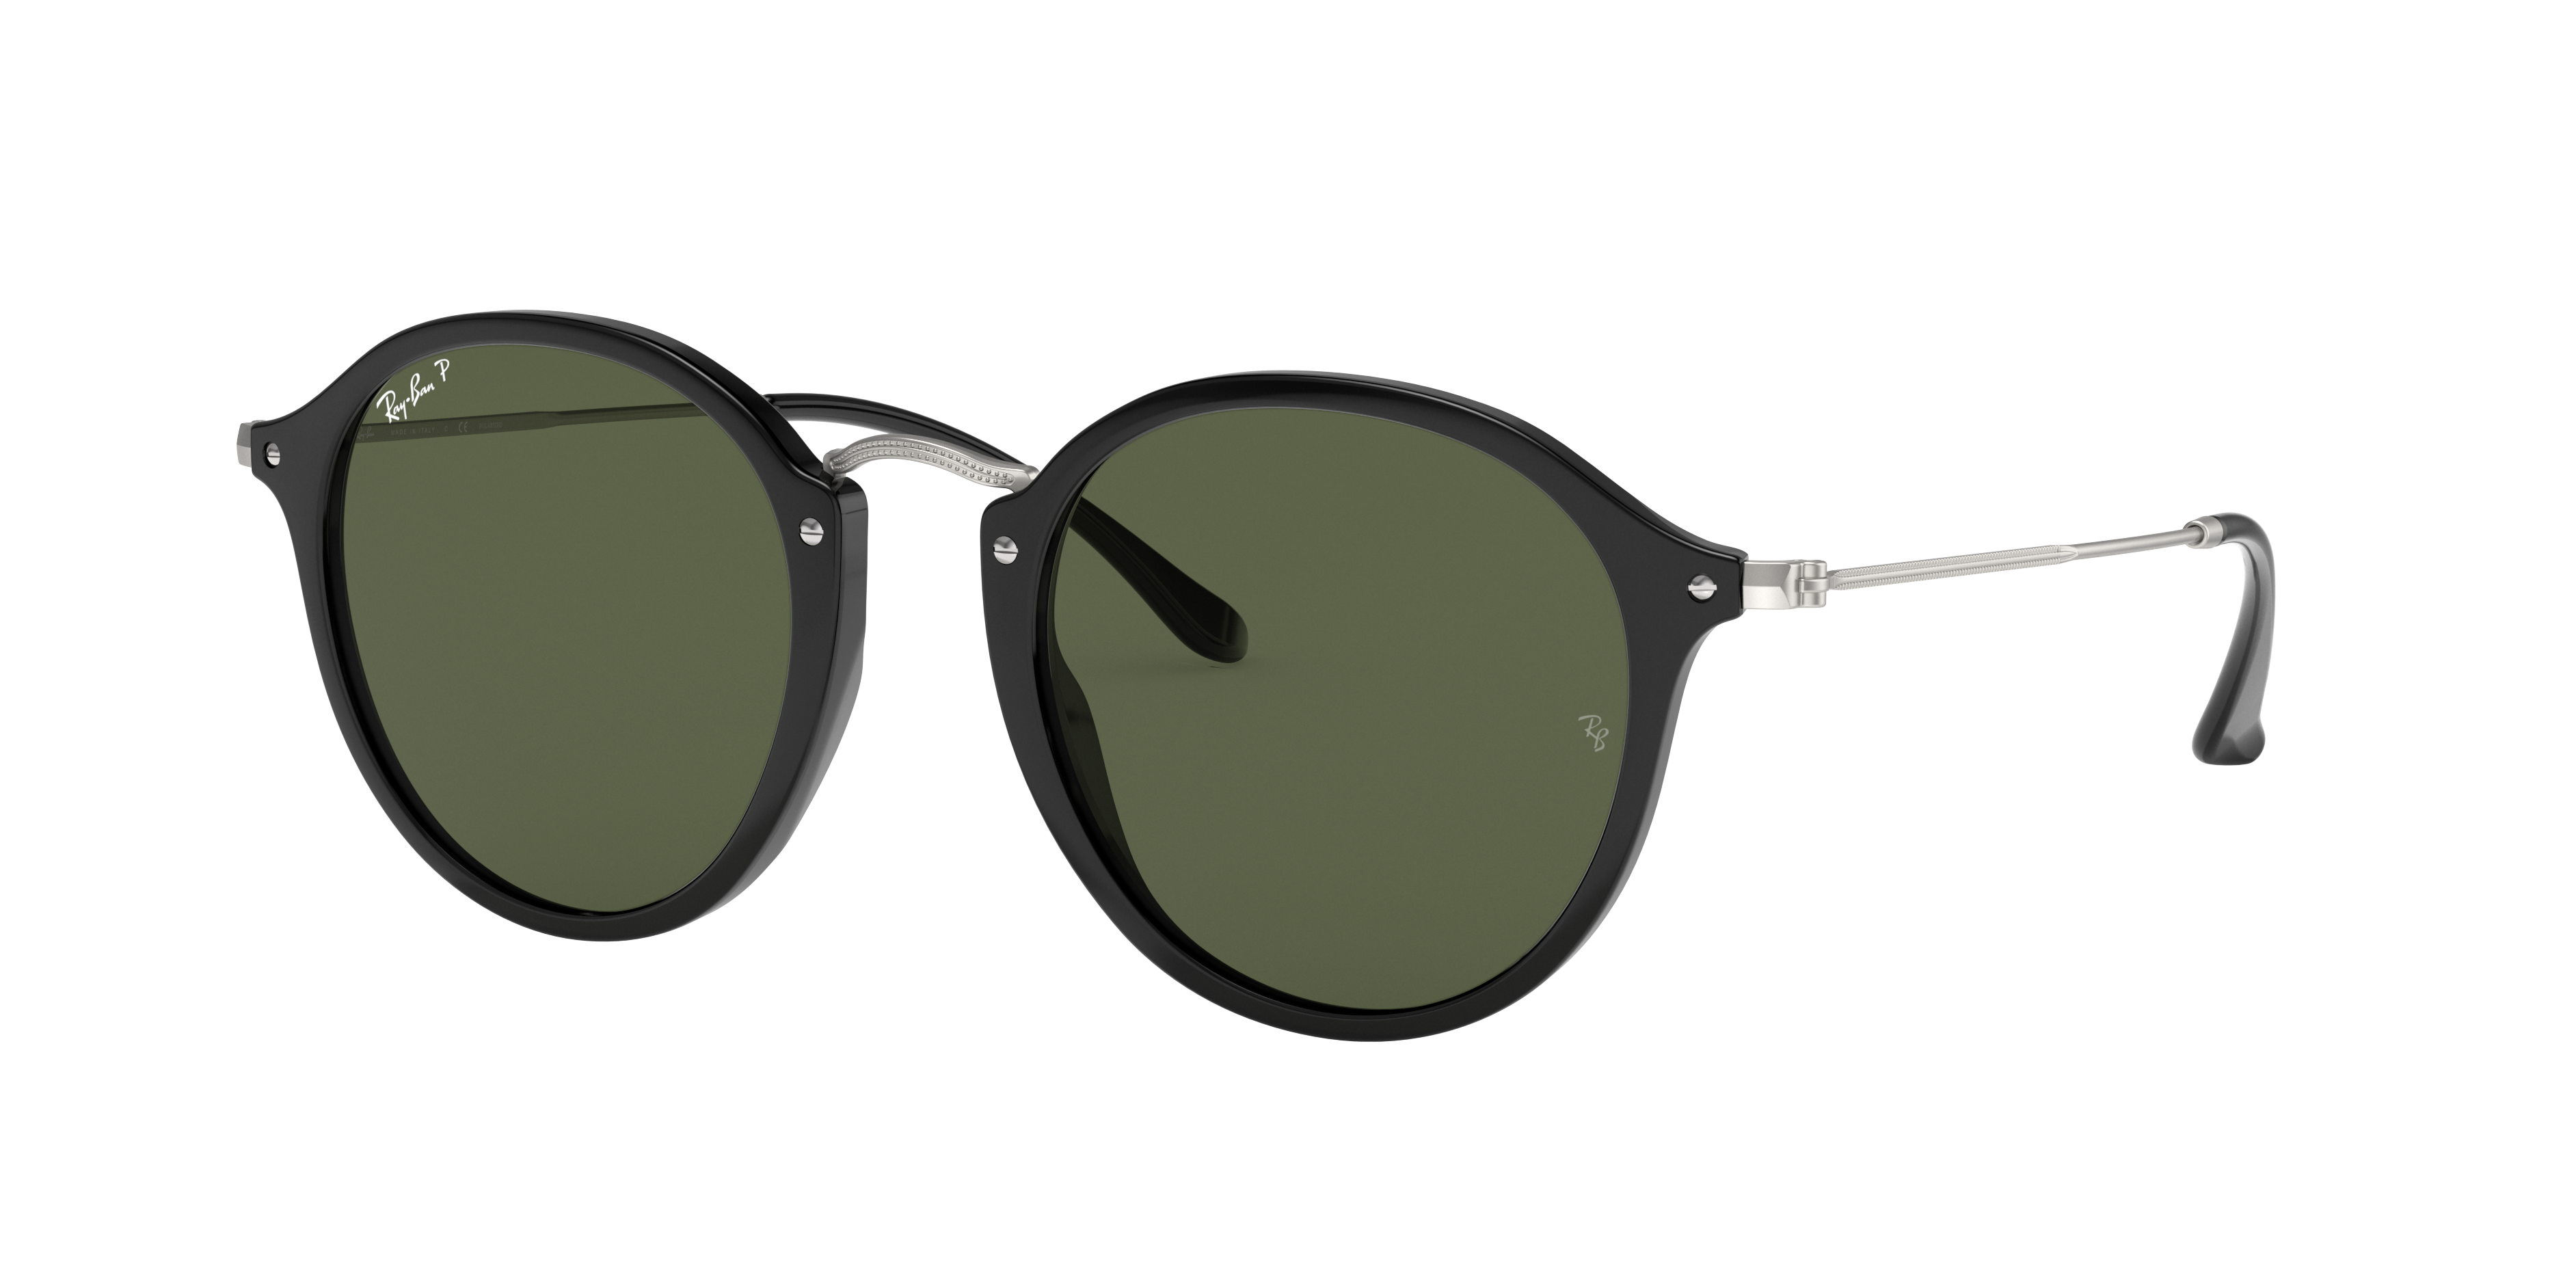 Ray-Ban Round Fleck Silver, Polarized Green Lenses - RB2447